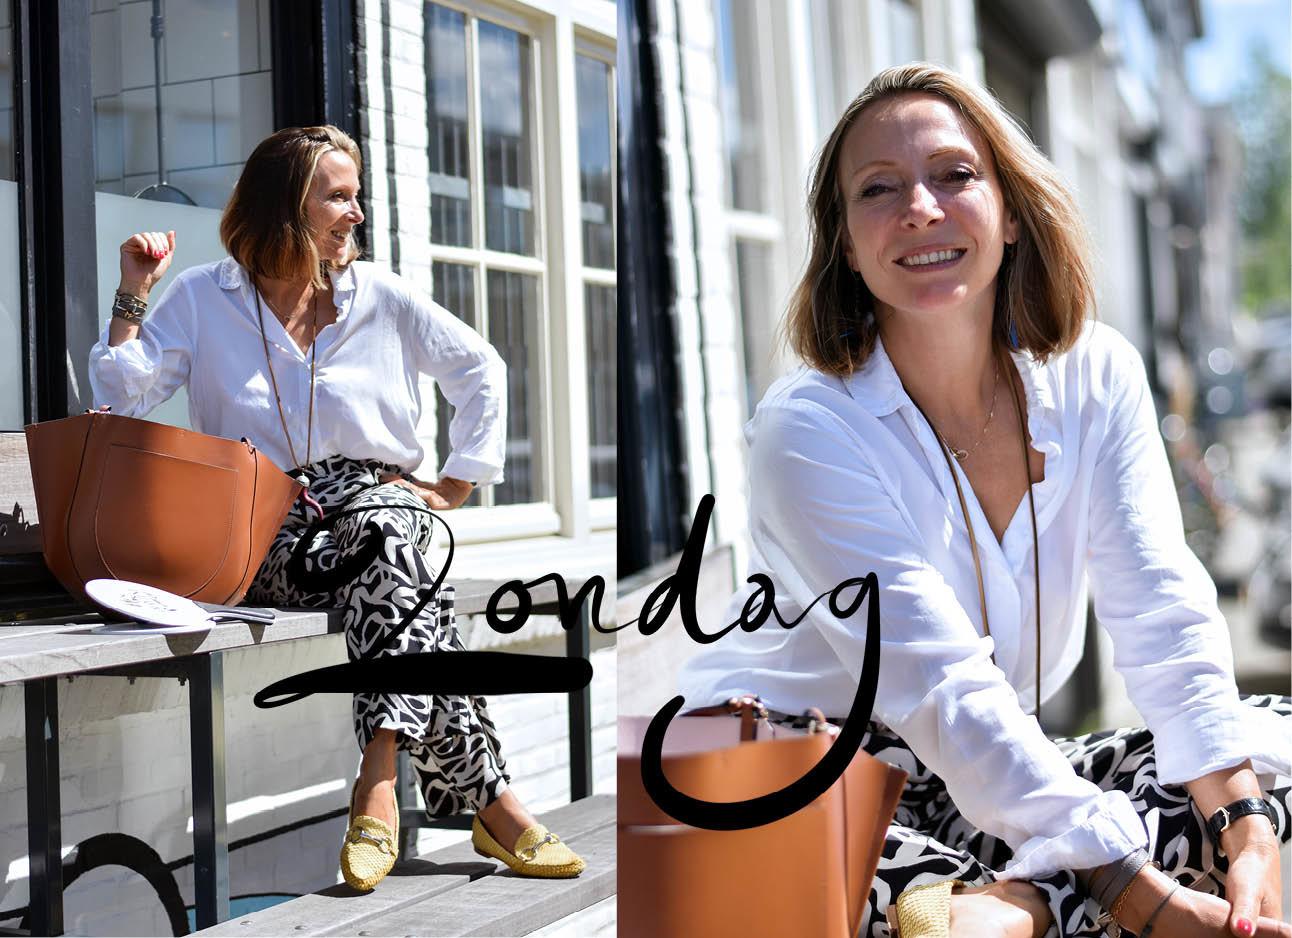 May-Britt Mobach lachend witte blouse met Wandler tas